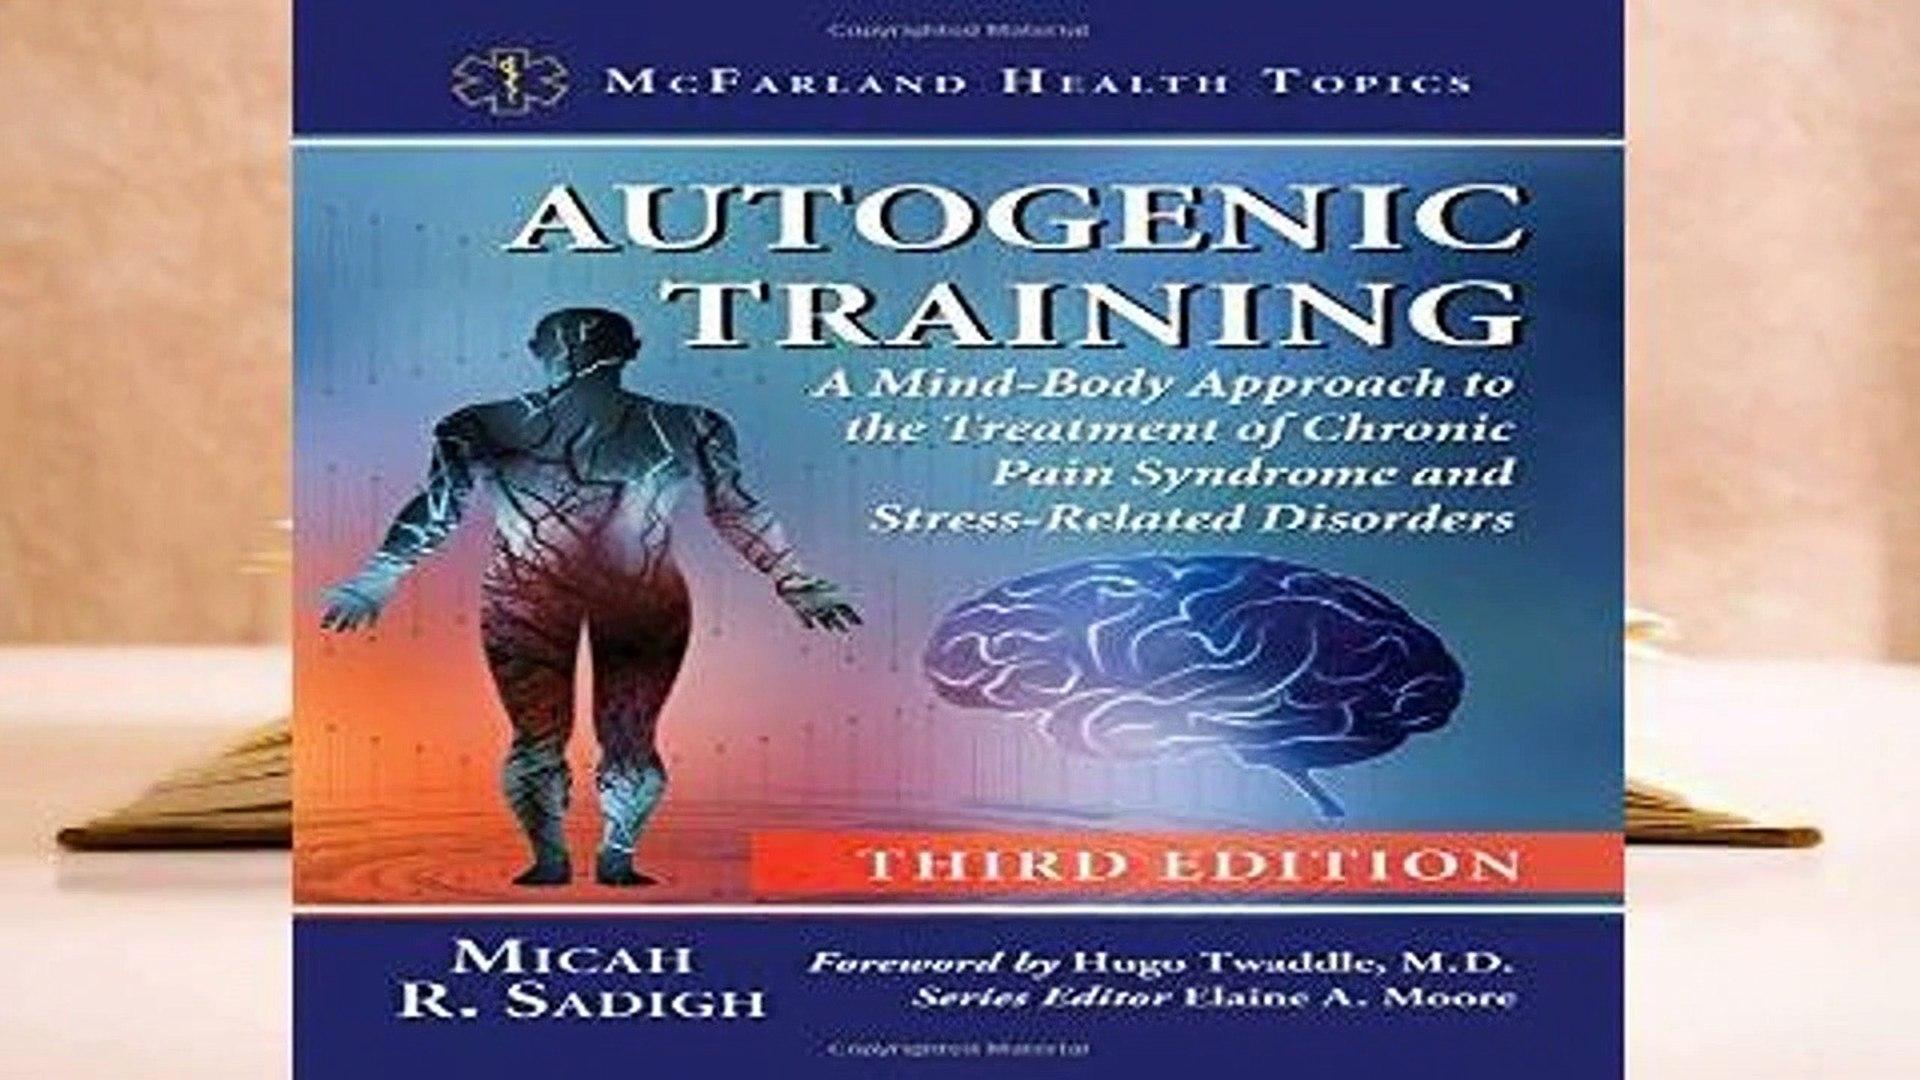 Autogenic Training (McFarland Health Topics) Complete